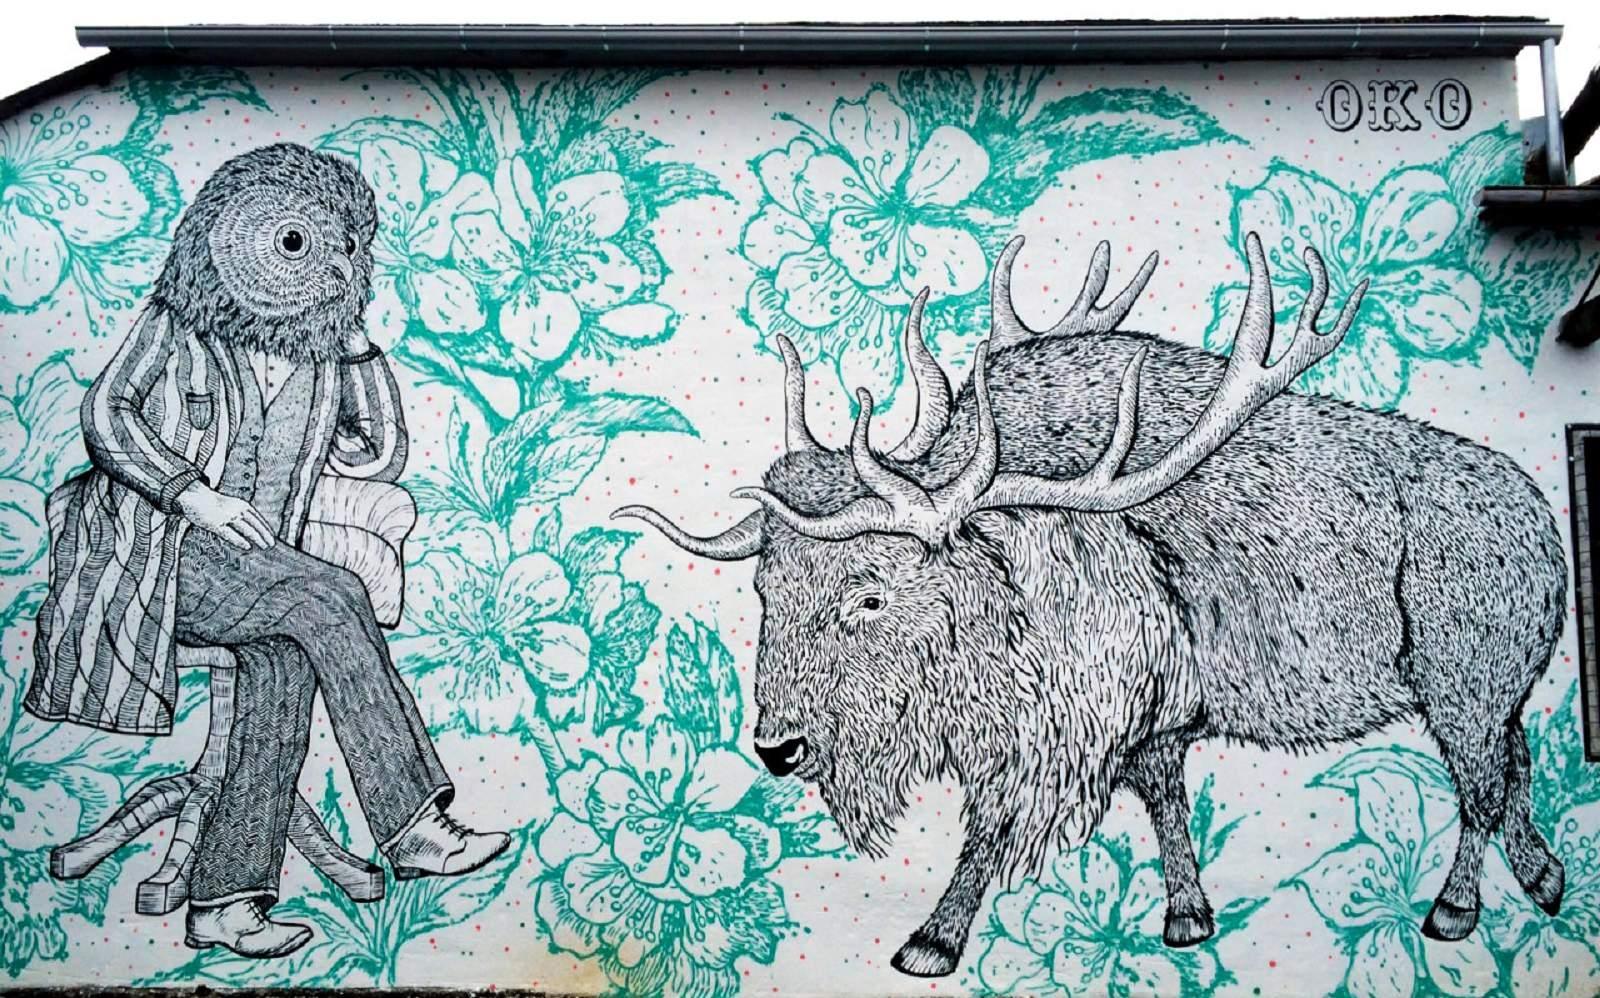 OKO Zagreb croatia street art